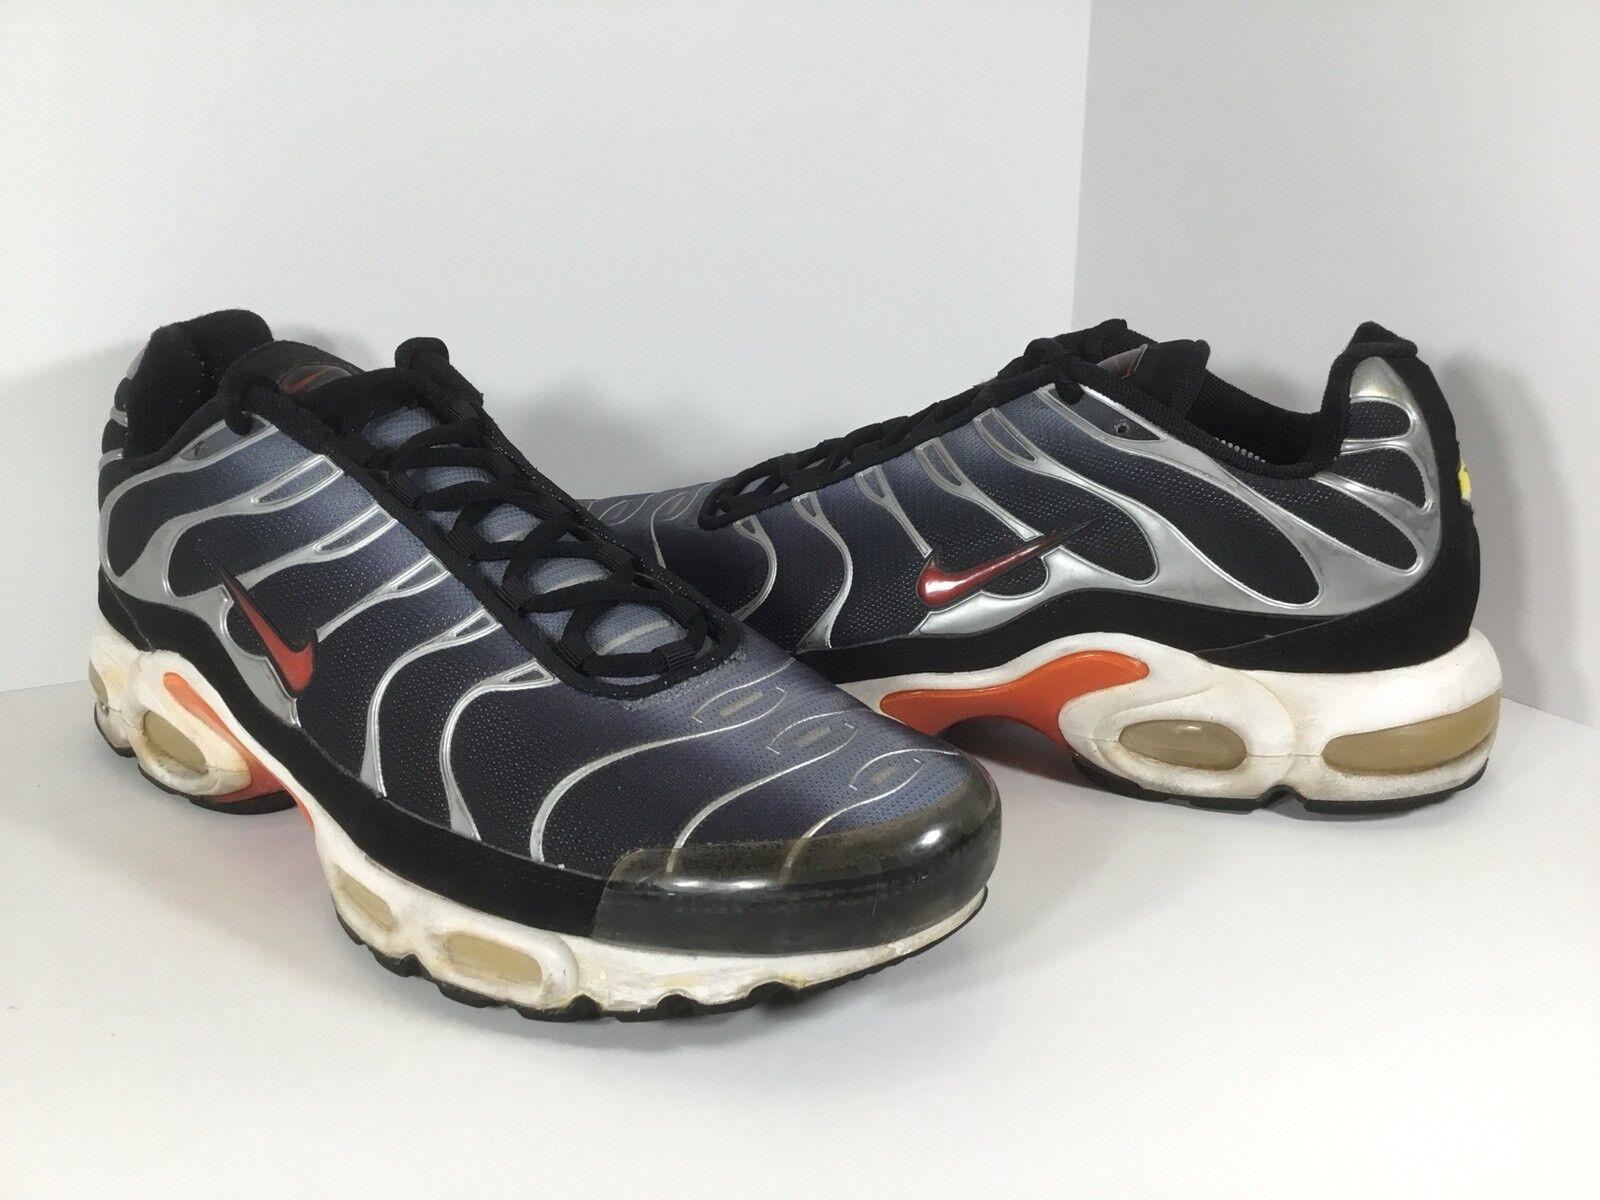 Nike Air Max Plus Machine Grey Silver Black White Mens Size 11 Rare 604133-061